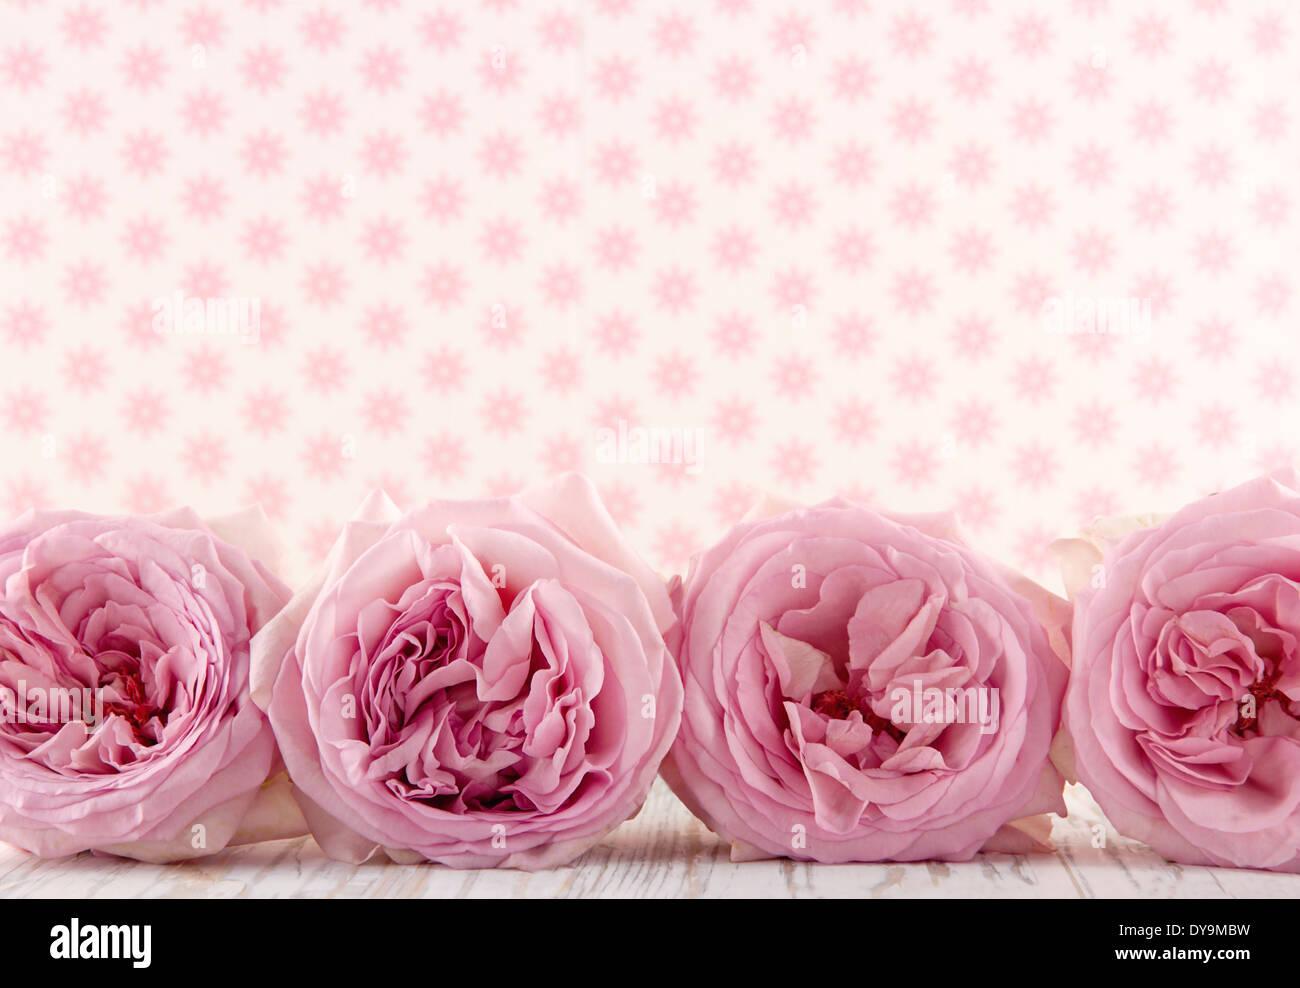 Pink Floral Wallpaper Stockfotos Pink Floral Wallpaper Bilder Alamy